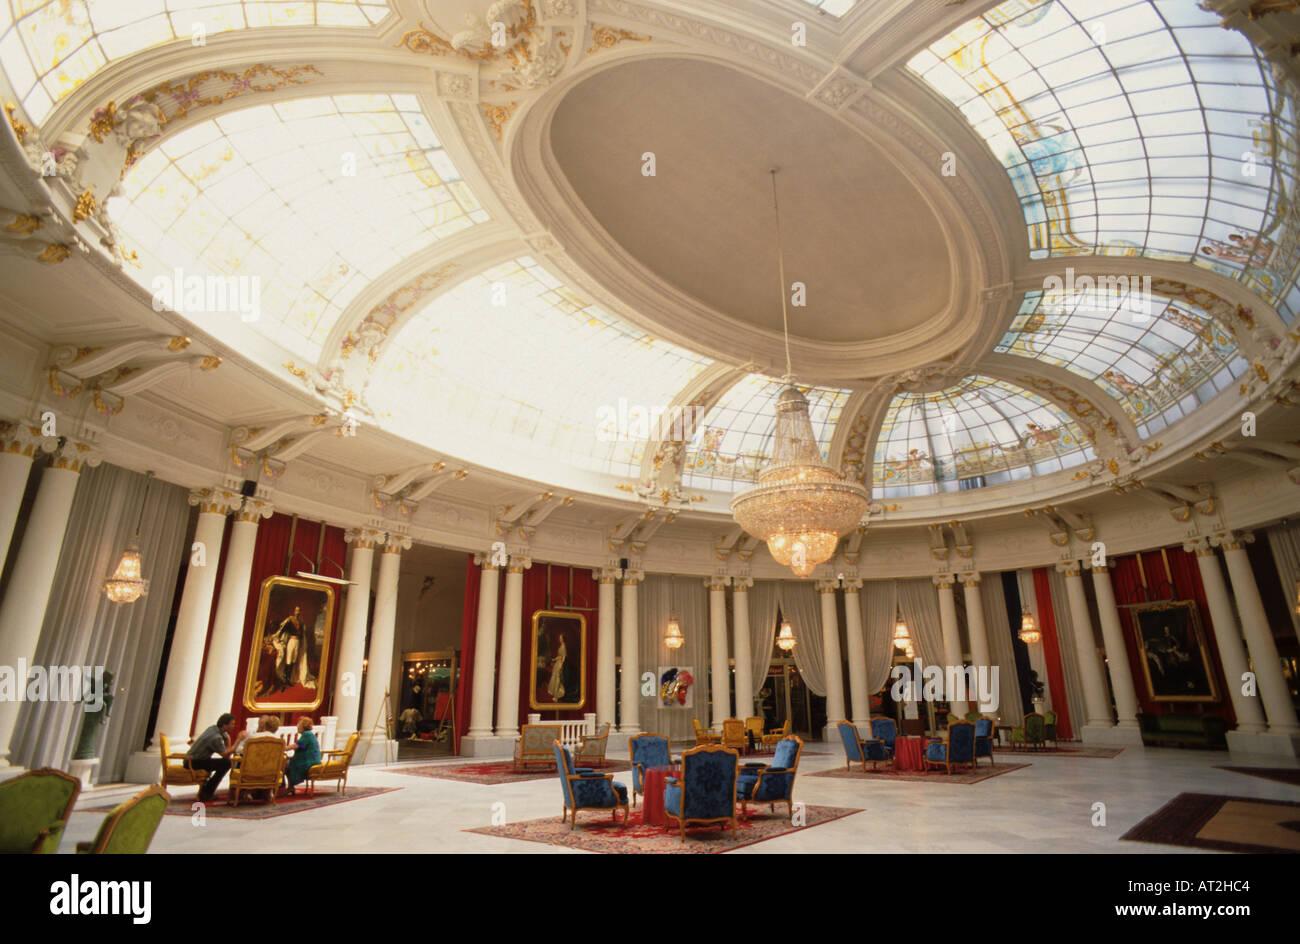 Saloon Royal Hotel Negresco Nice France - Stock Image